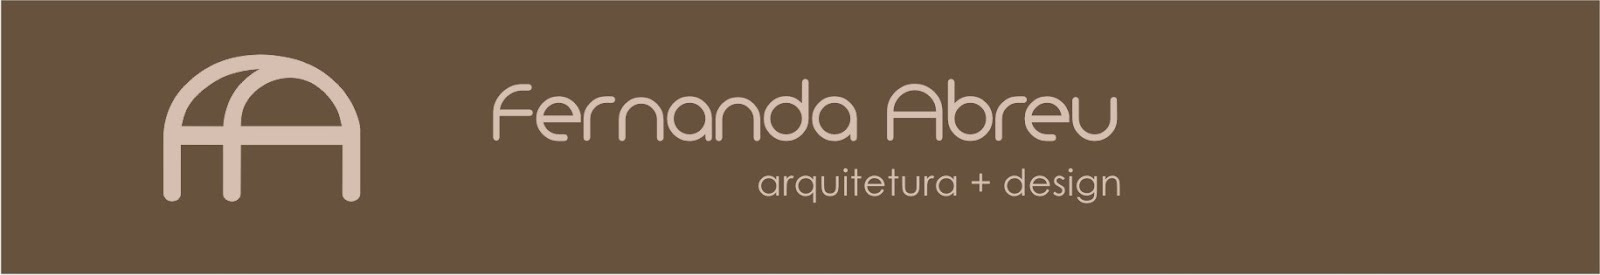 Arq. Fernanda Abreu